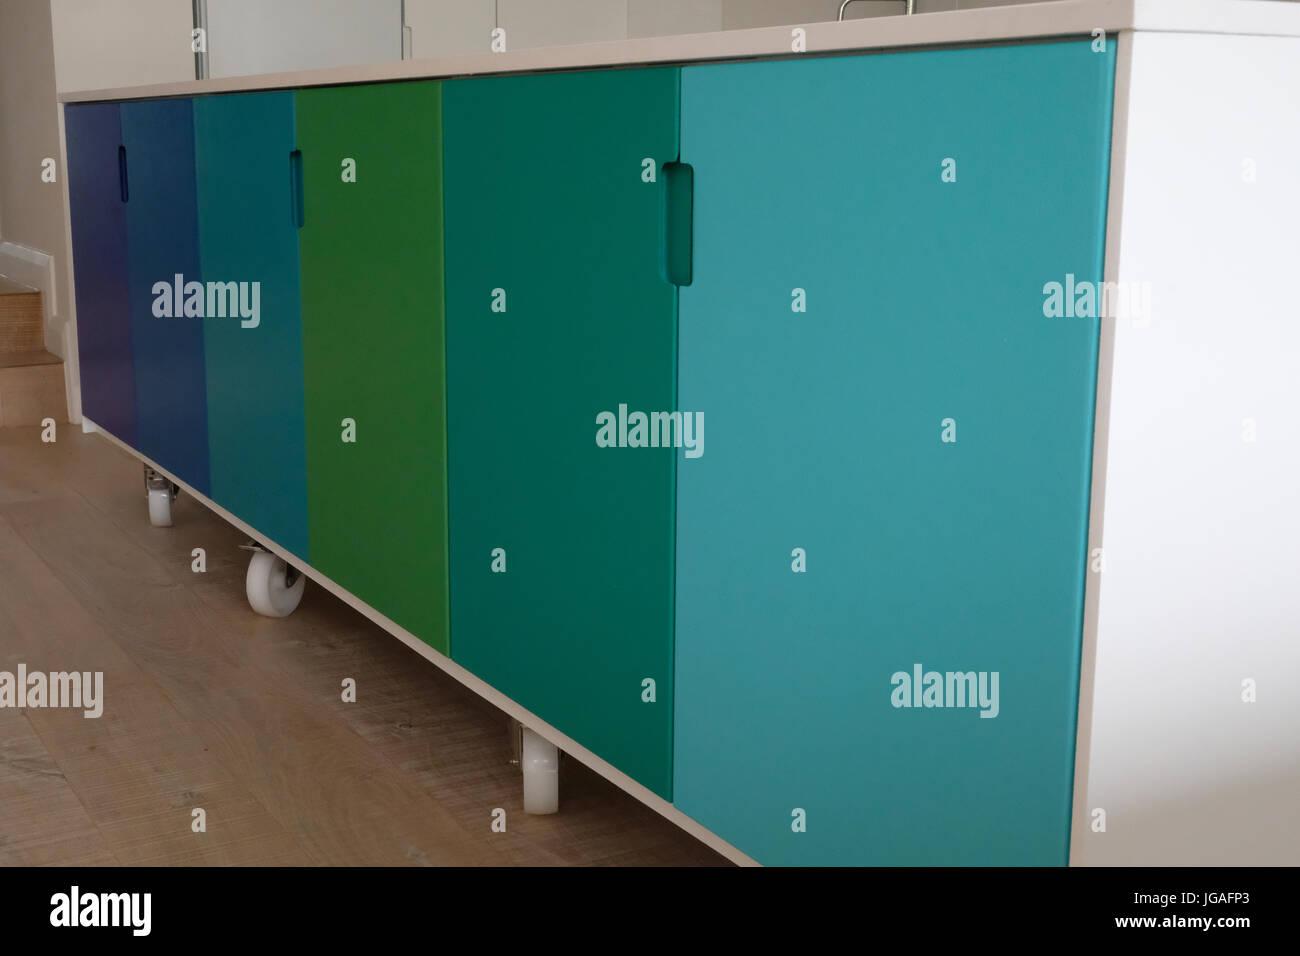 Movable kitchen island on castor wheels Stock Photo: 147749339 - Alamy